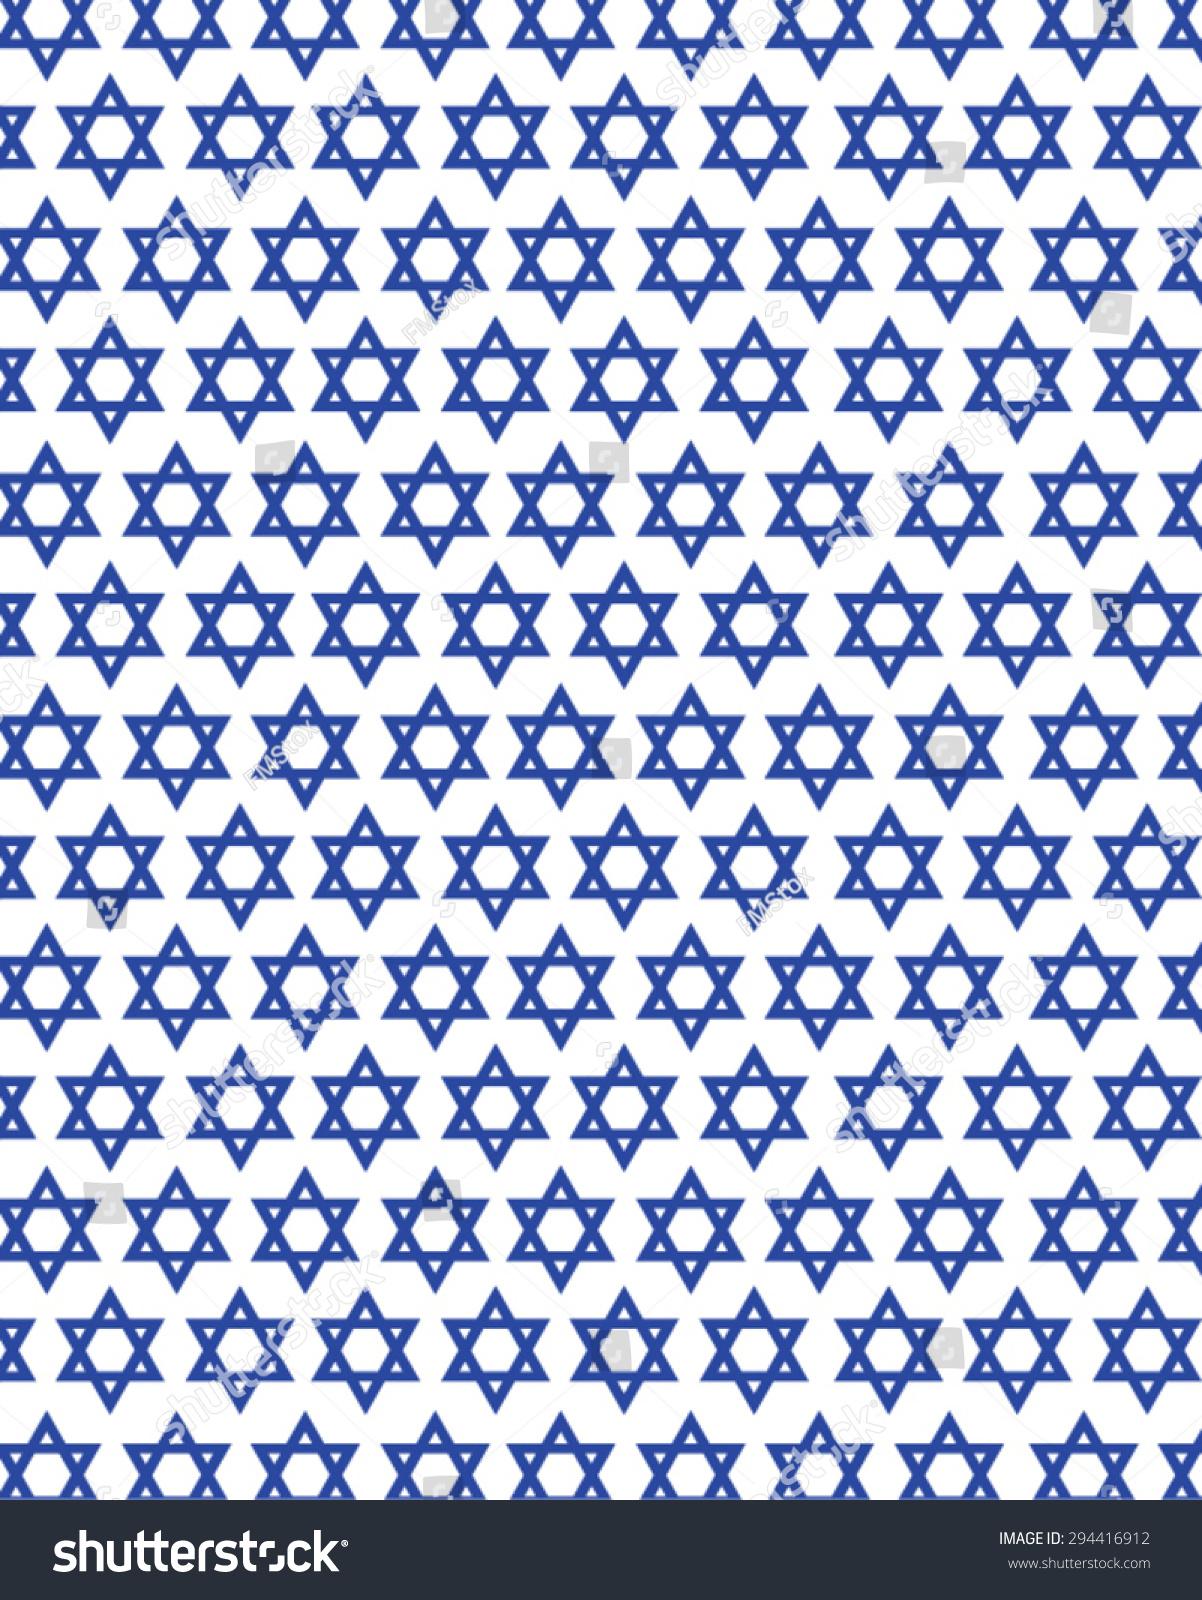 Jewish Star of David Wallpaper - Vector.